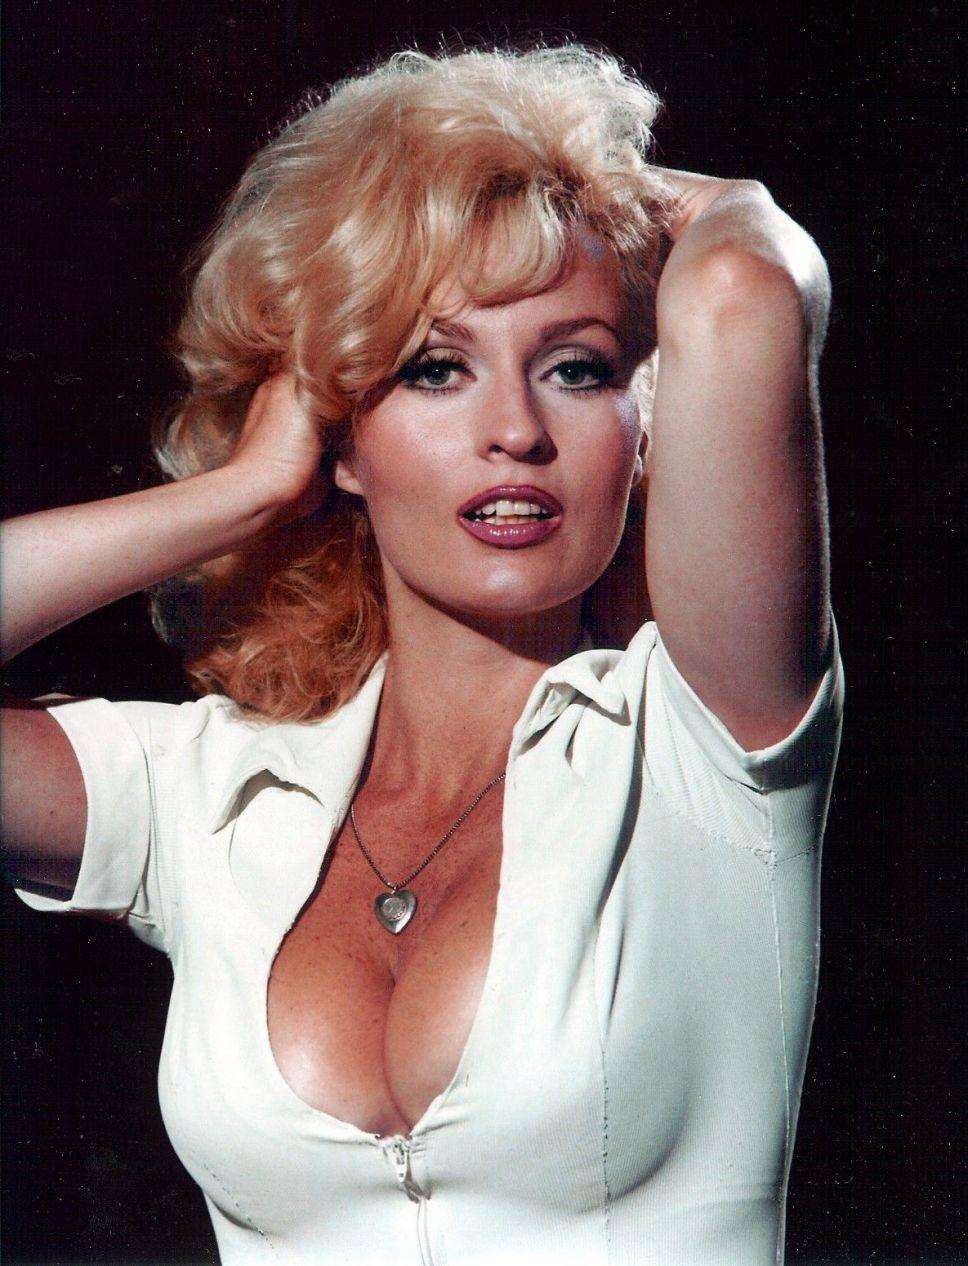 Cara Pifko,Alison Sweeney Erotic clip Mariel Rodriguez (b. 1984),Cary Elwes (born 1962)